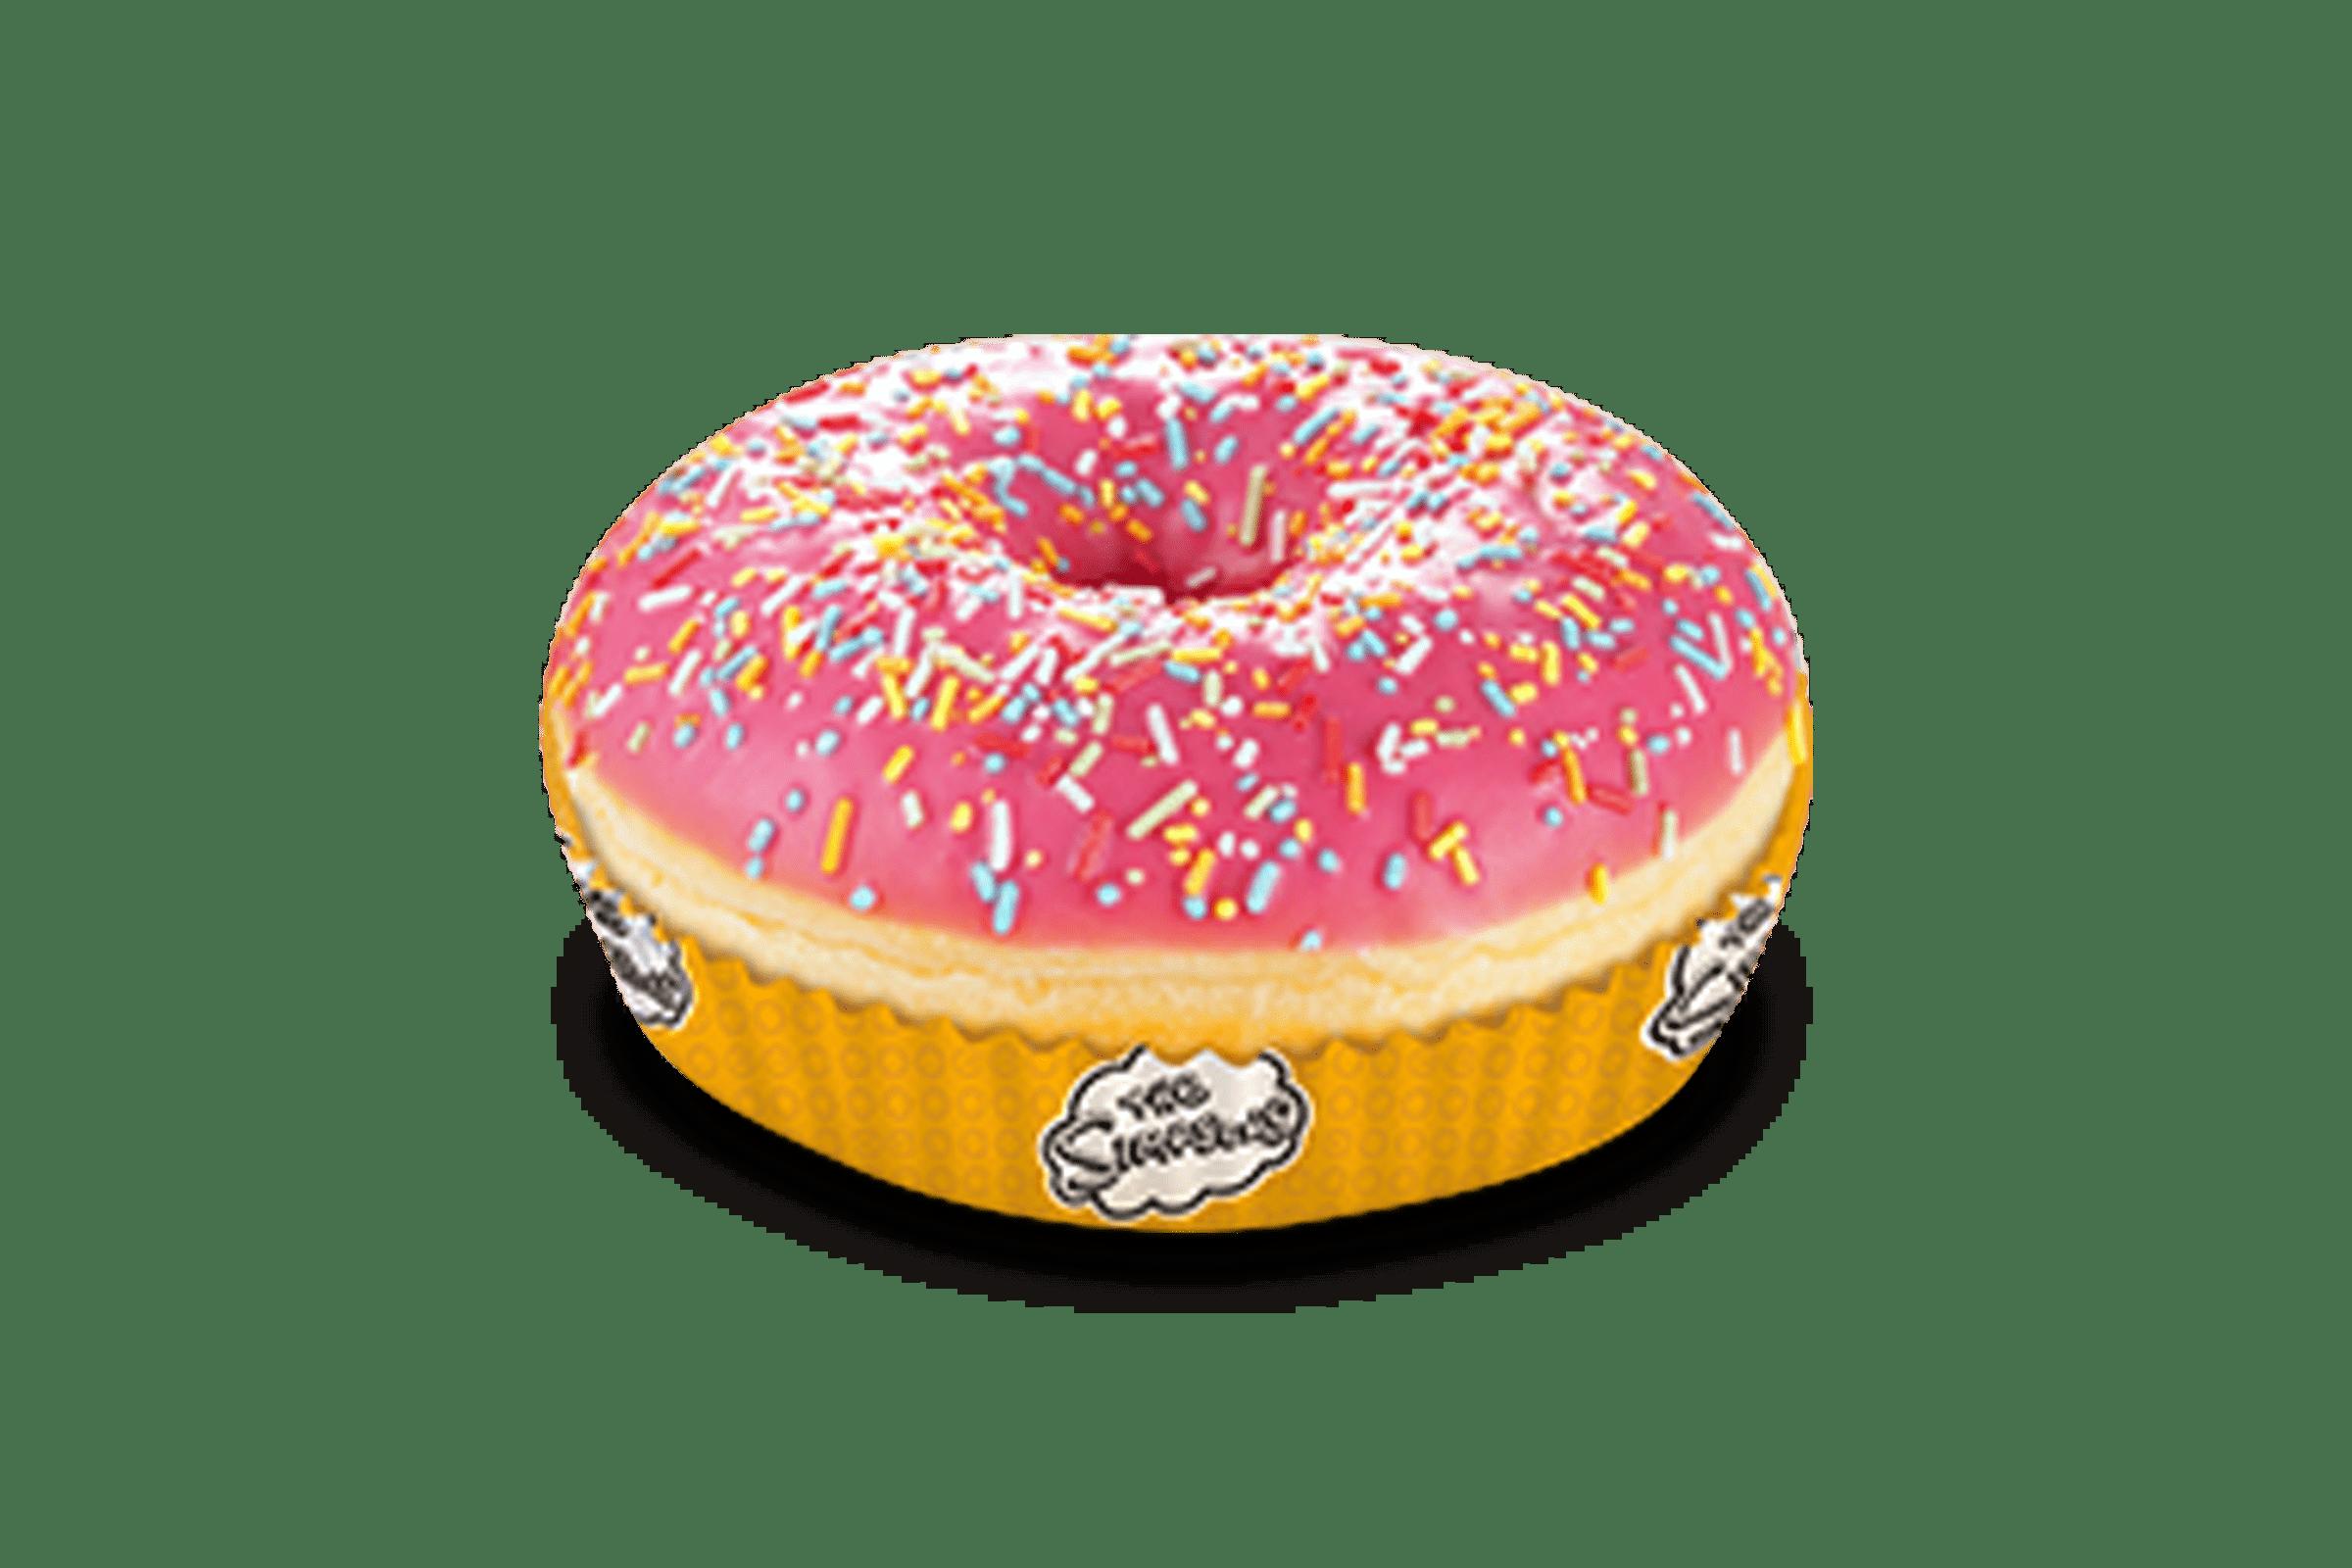 Simpsons Donut 1